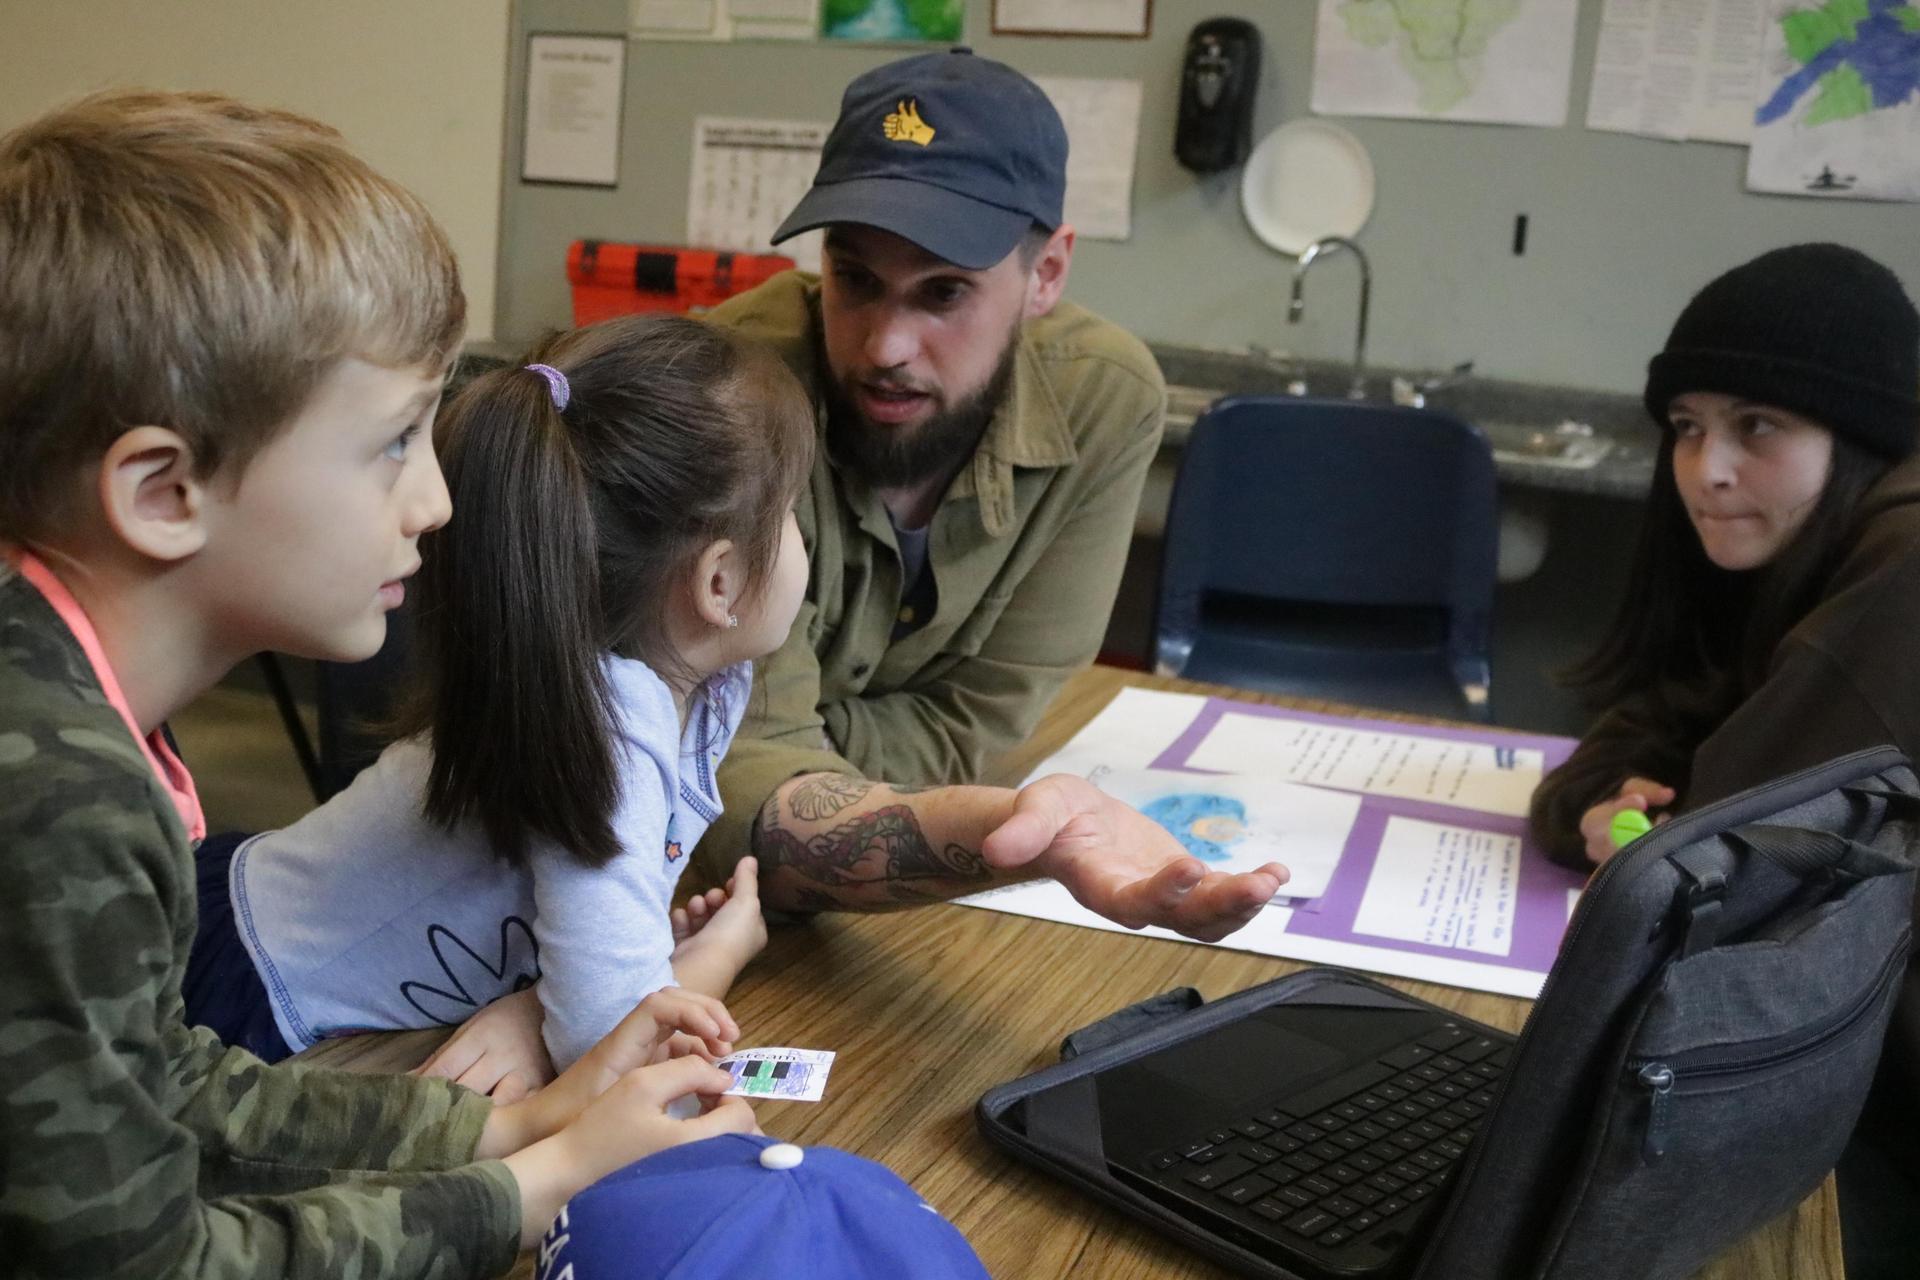 A teacher talks to students